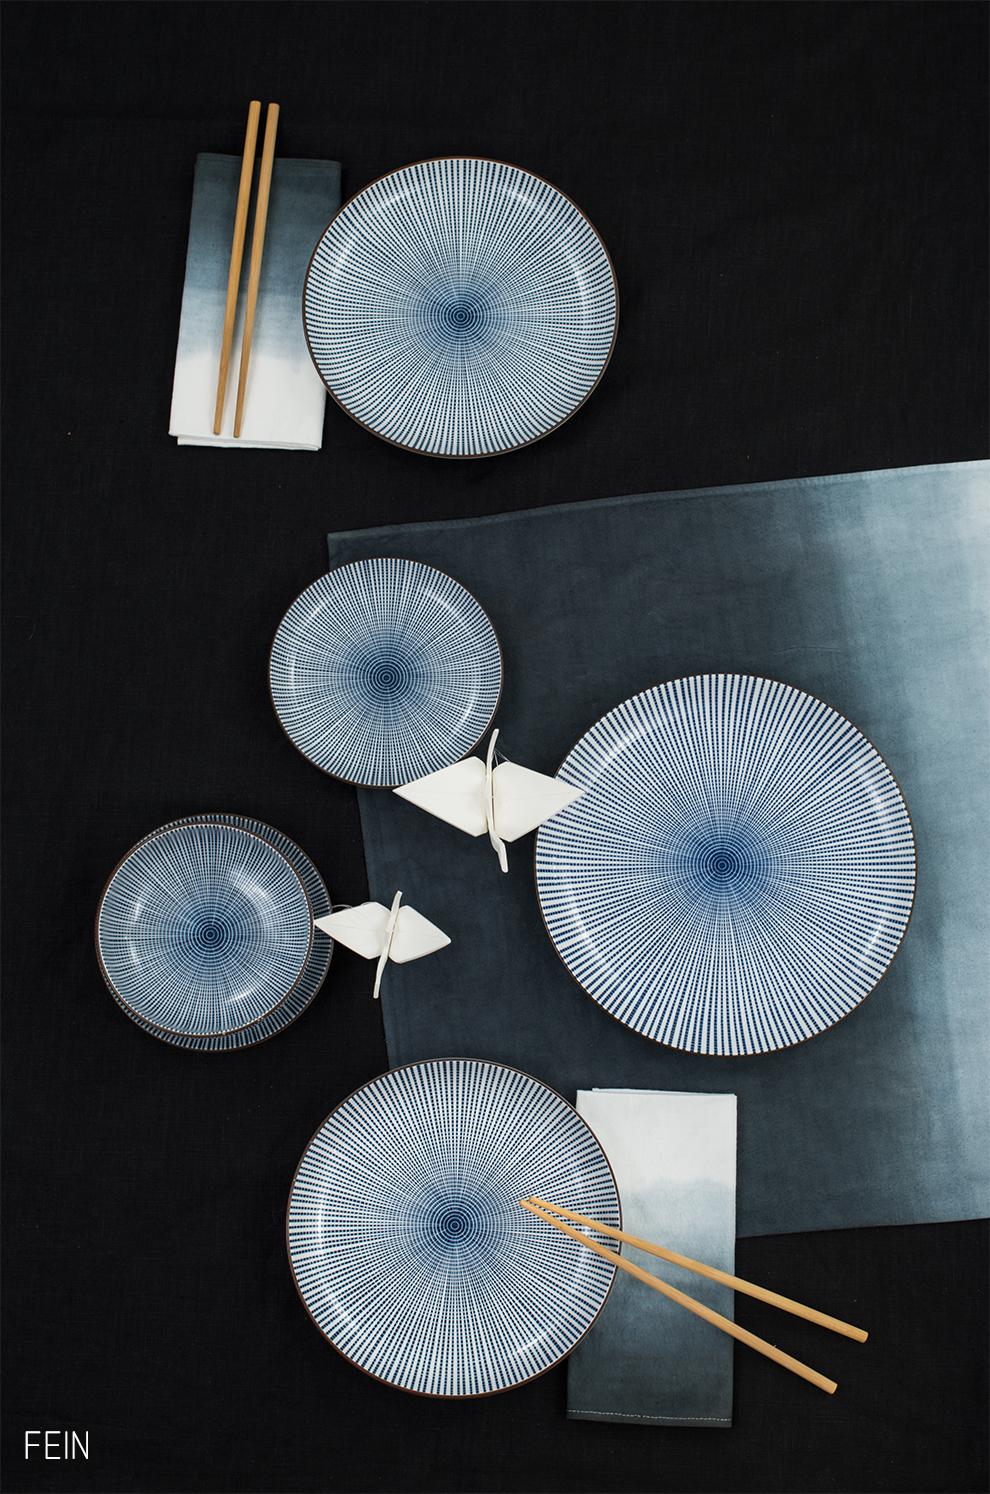 design geschirr top mila keramik with design geschirr stunning arte viva kaffee und nobile. Black Bedroom Furniture Sets. Home Design Ideas